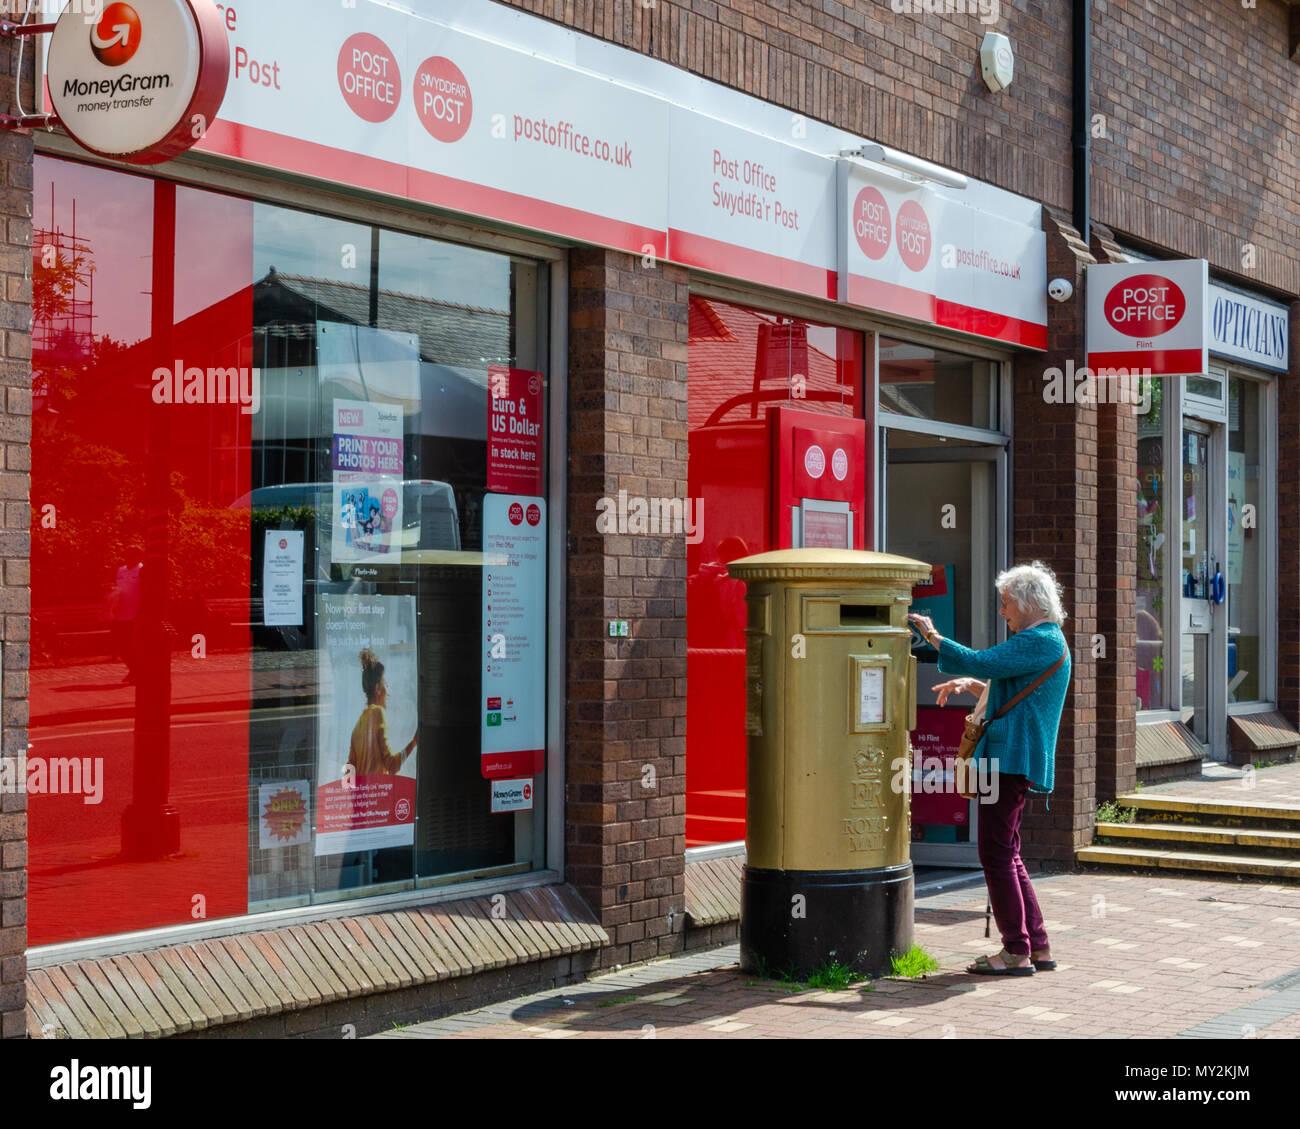 Flint, UK: June 4, 2018: An elderly woman posts some letters in a post box outside Flint Post Office. Stock Photo